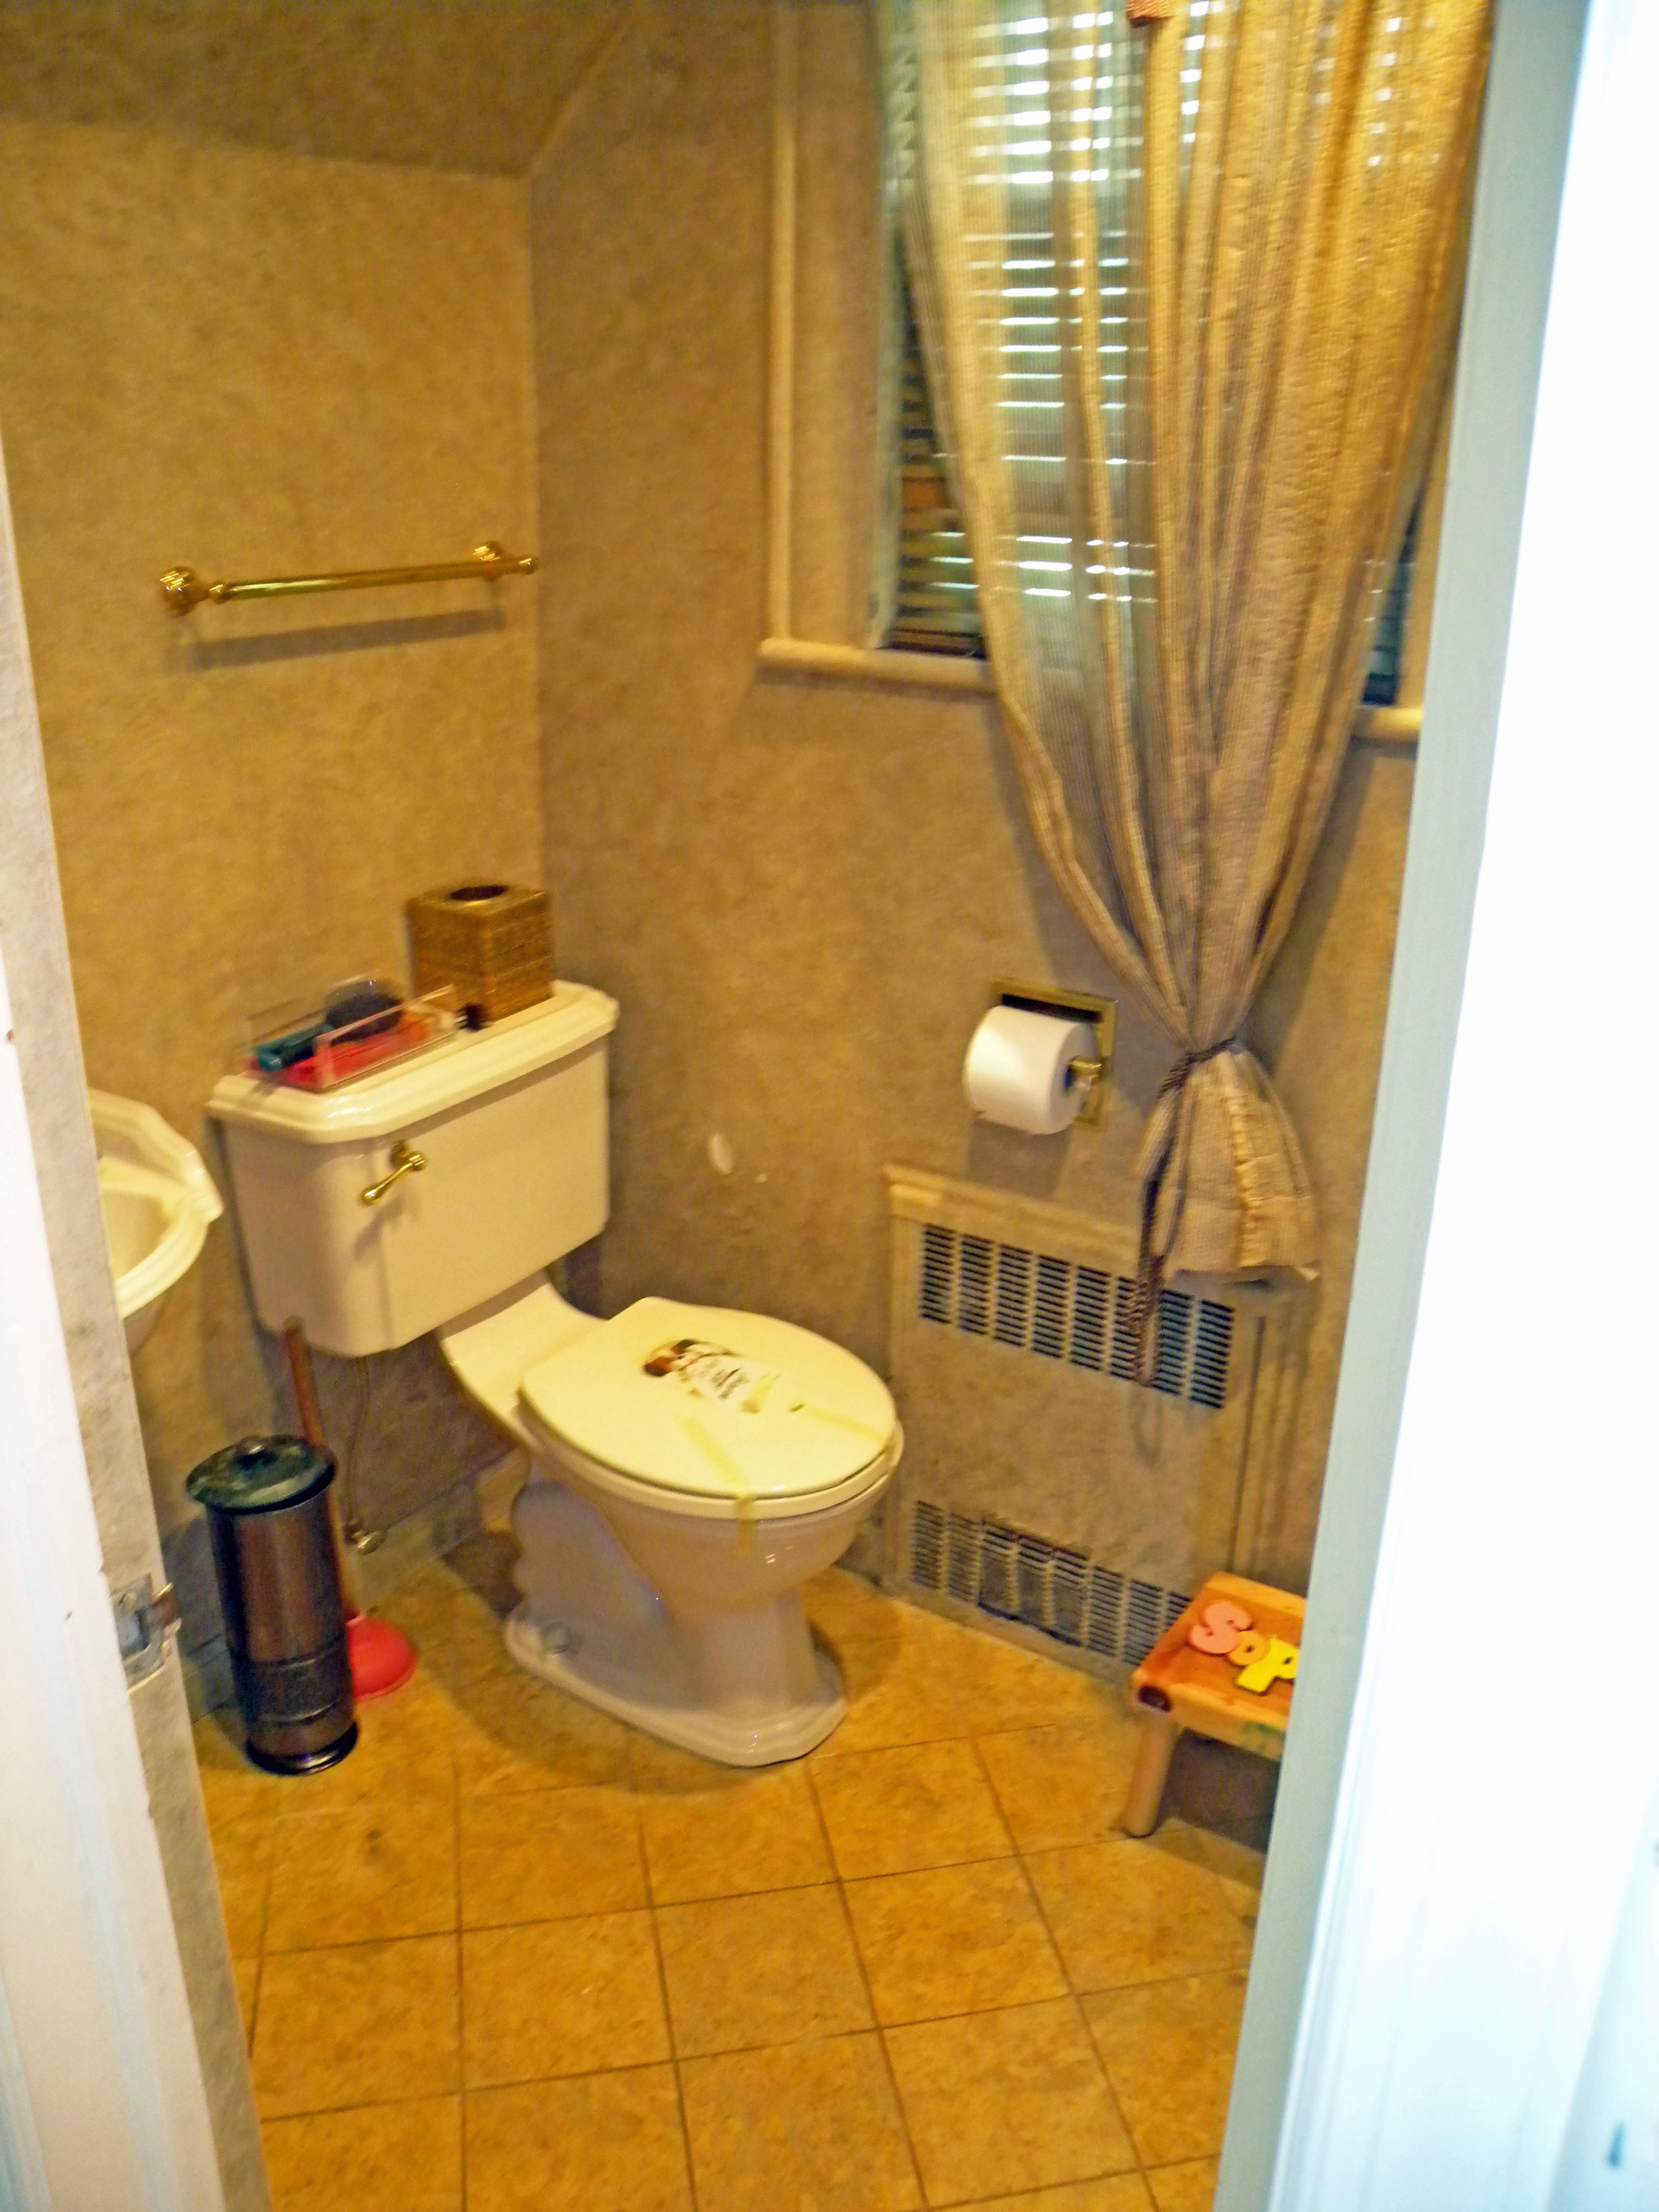 Shower Tile Bathroom Bath Corner Seat Mosaic Tile Accessories Traditional Ivory